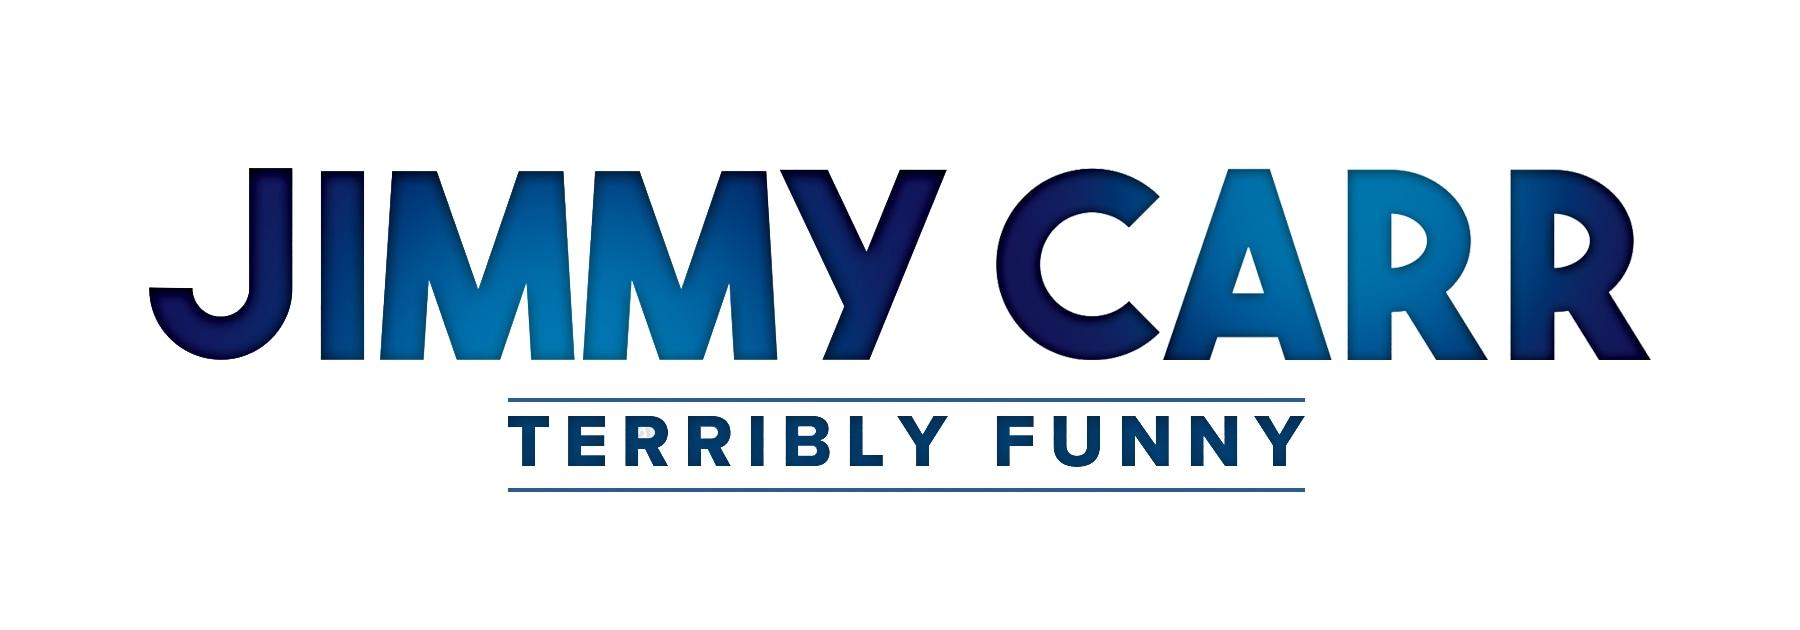 Jimmy Carr Terribly Funny header